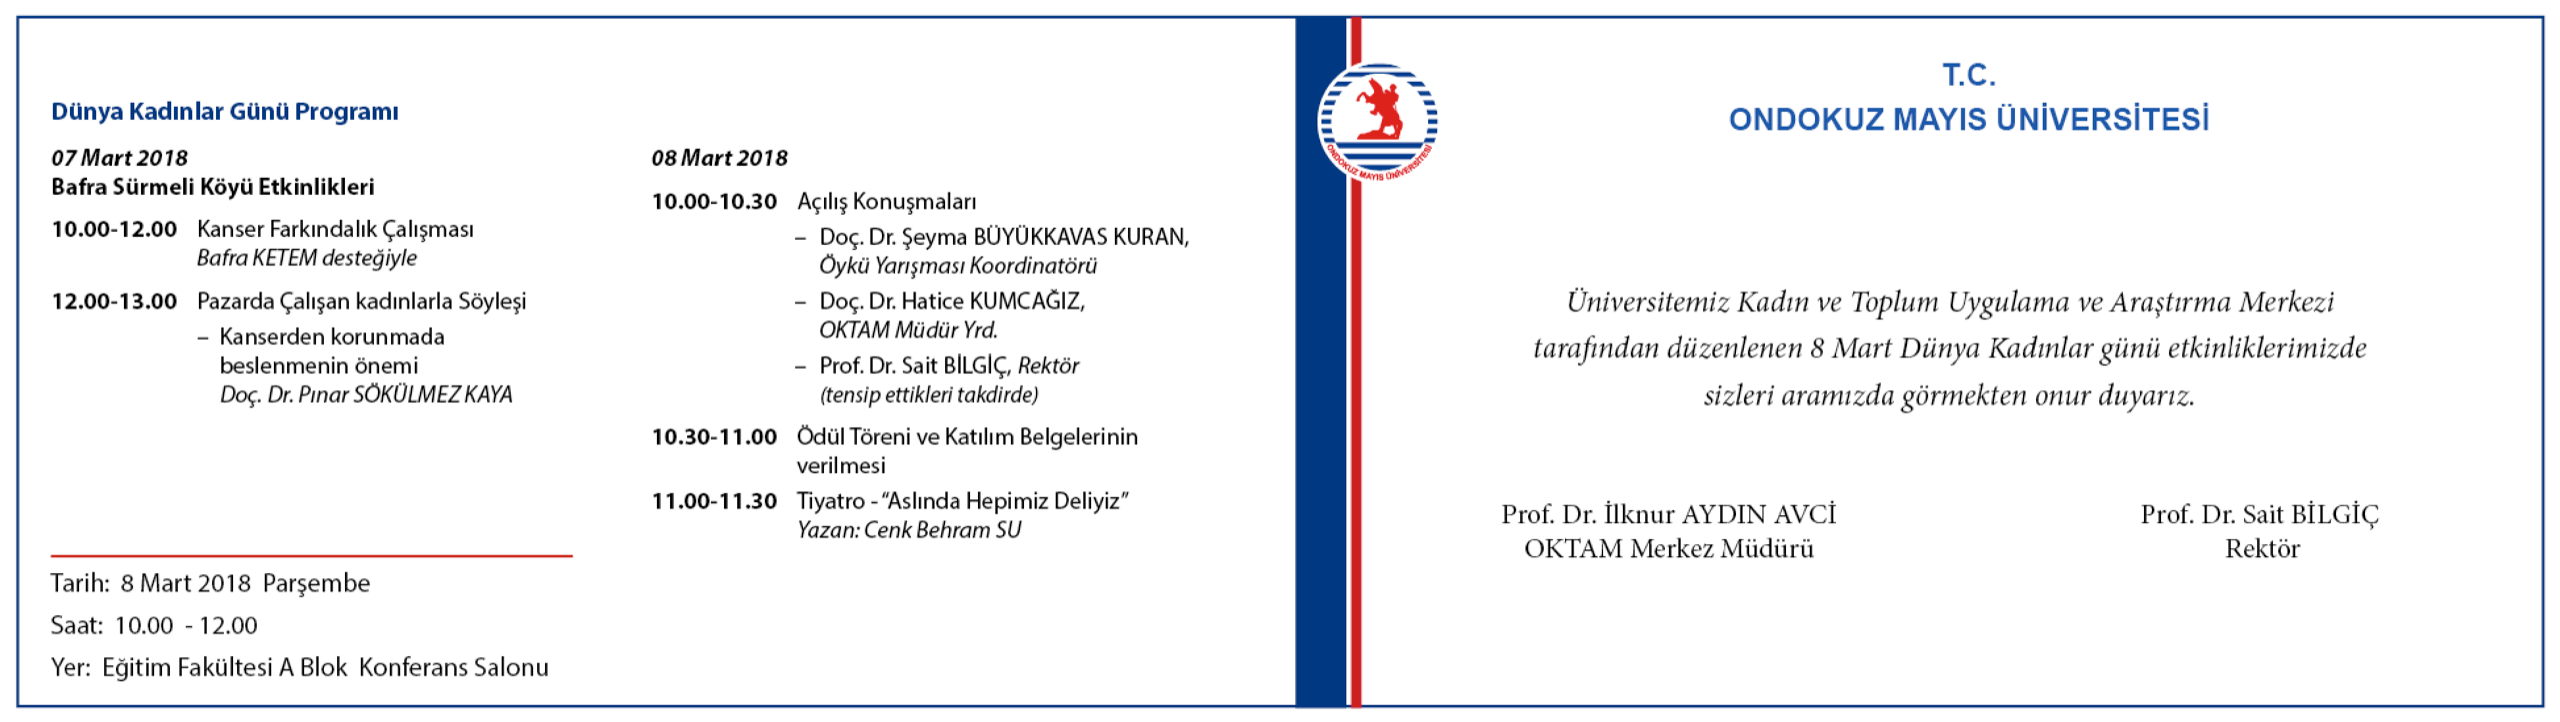 https://www.omu.edu.tr/sites/default/files/oktam_davetiye_2018-03-02_15.13.15.png